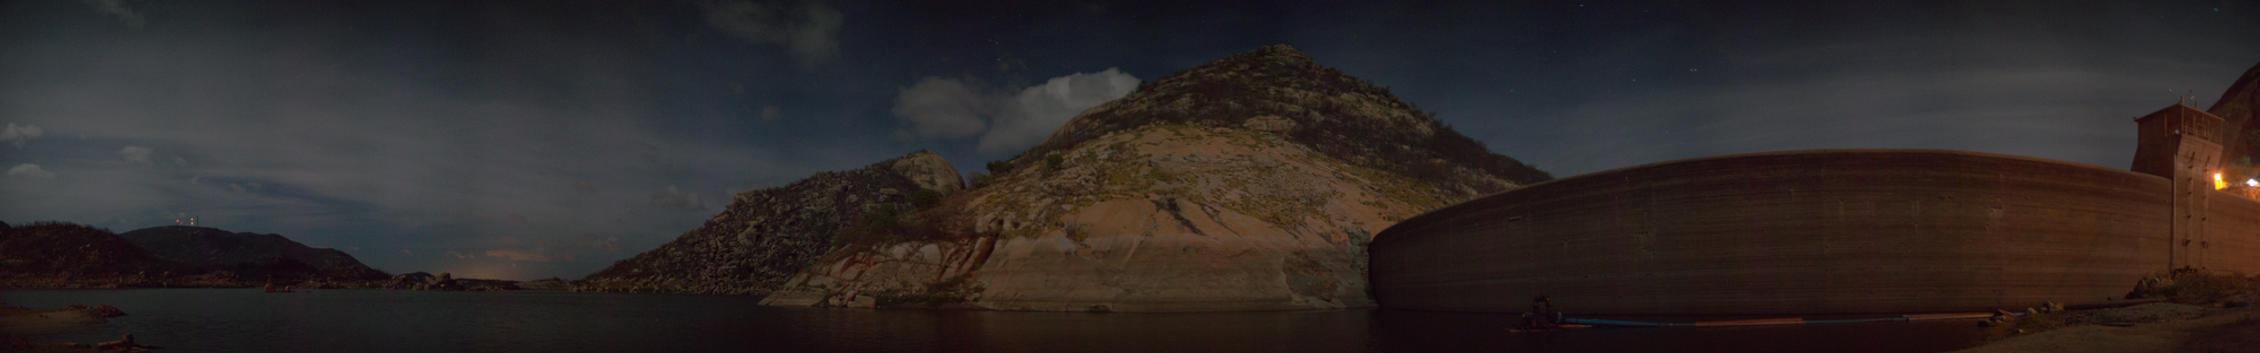 Gargalheira's Dam at night by YOWYO